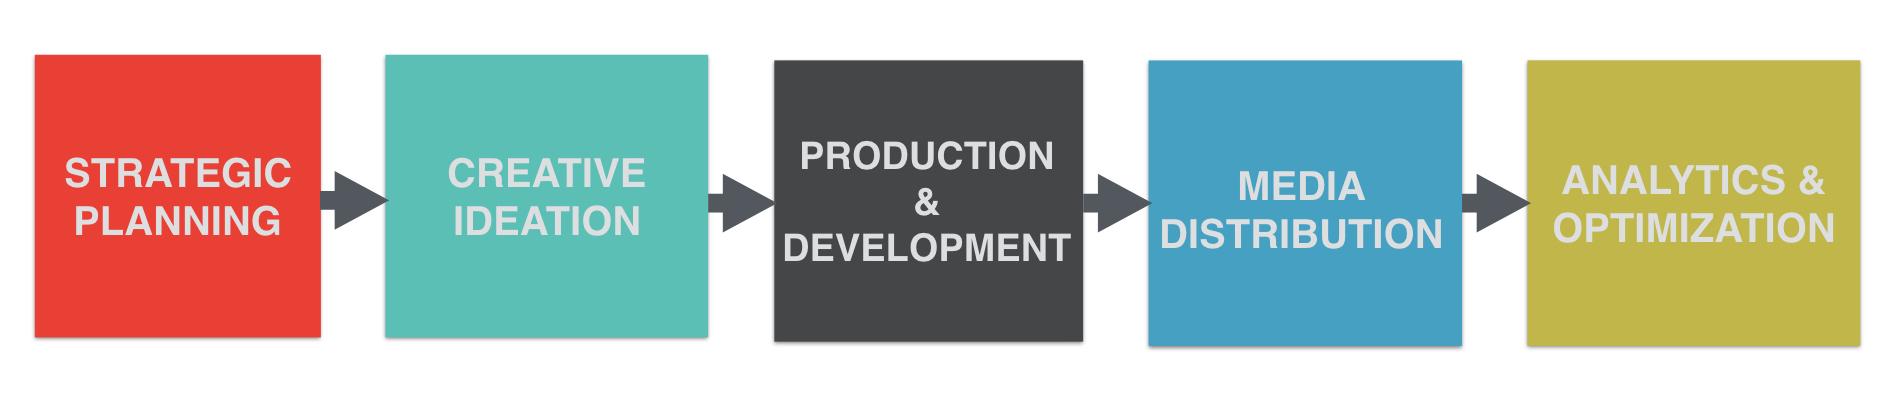 Strategydiagram_DorseyProcess.001.jpeg